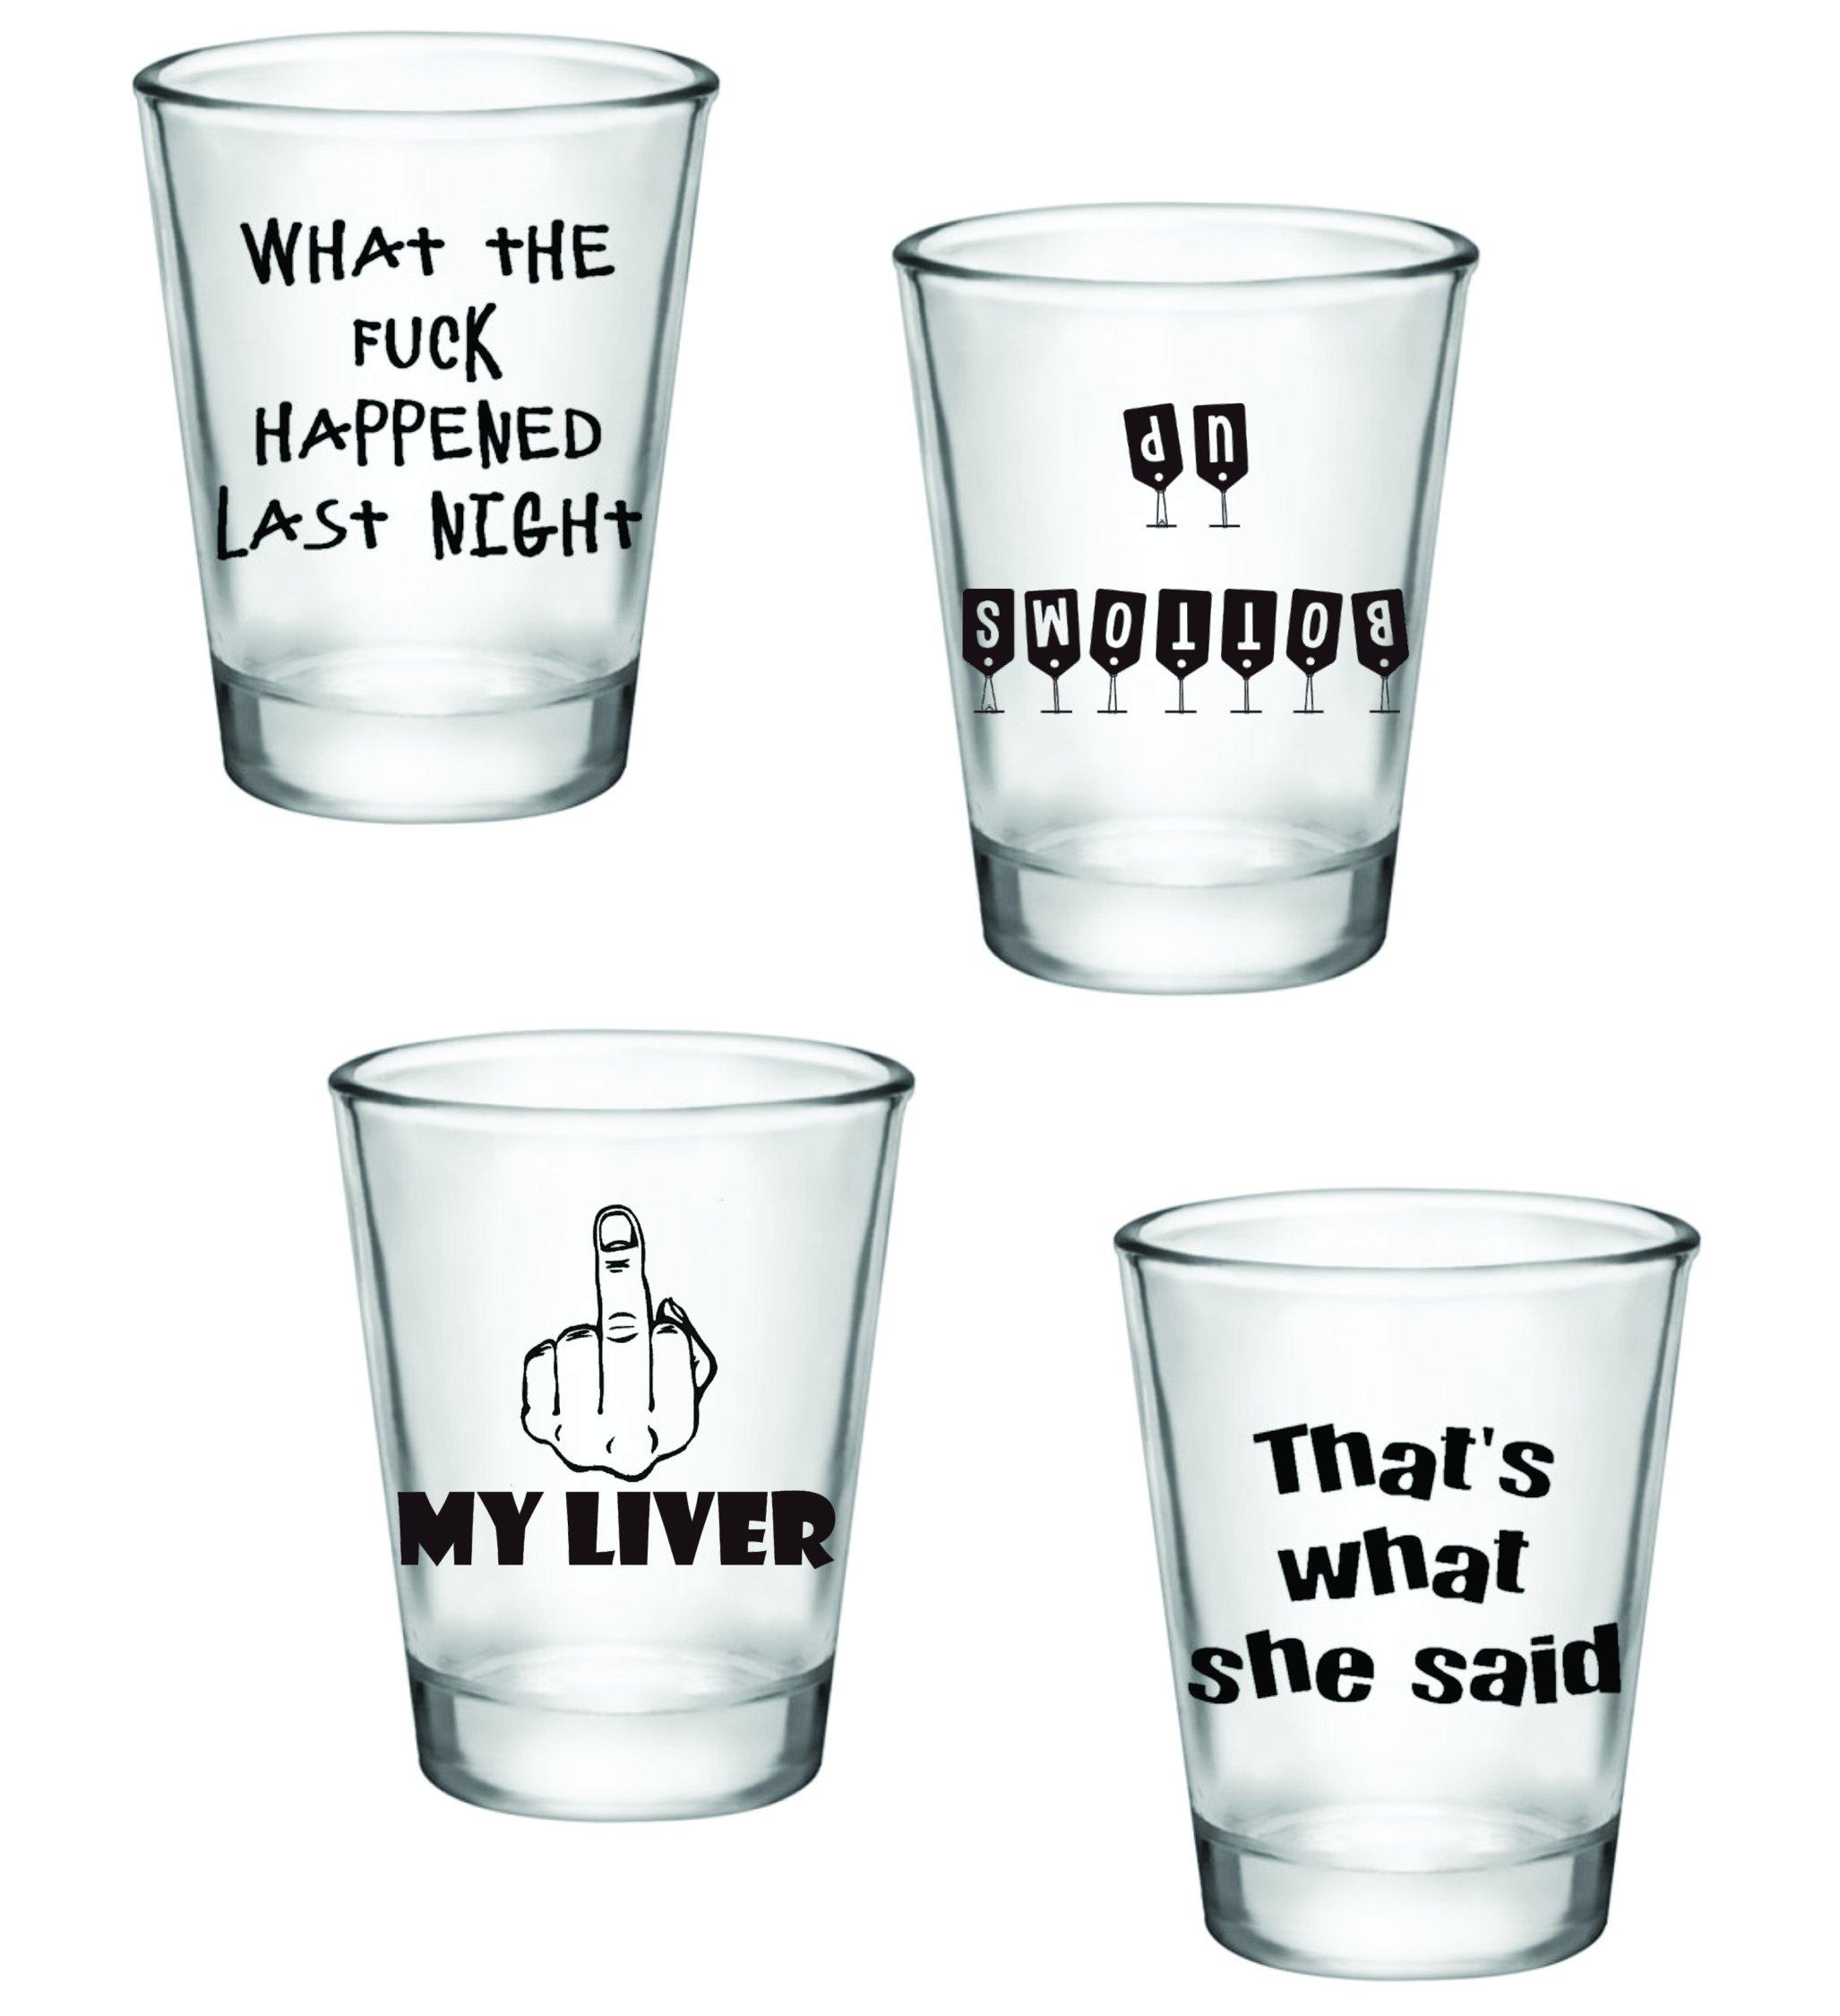 Gift Pack - Funny Shot Glasses - Set of 4 (2oz) - Great Gift Idea